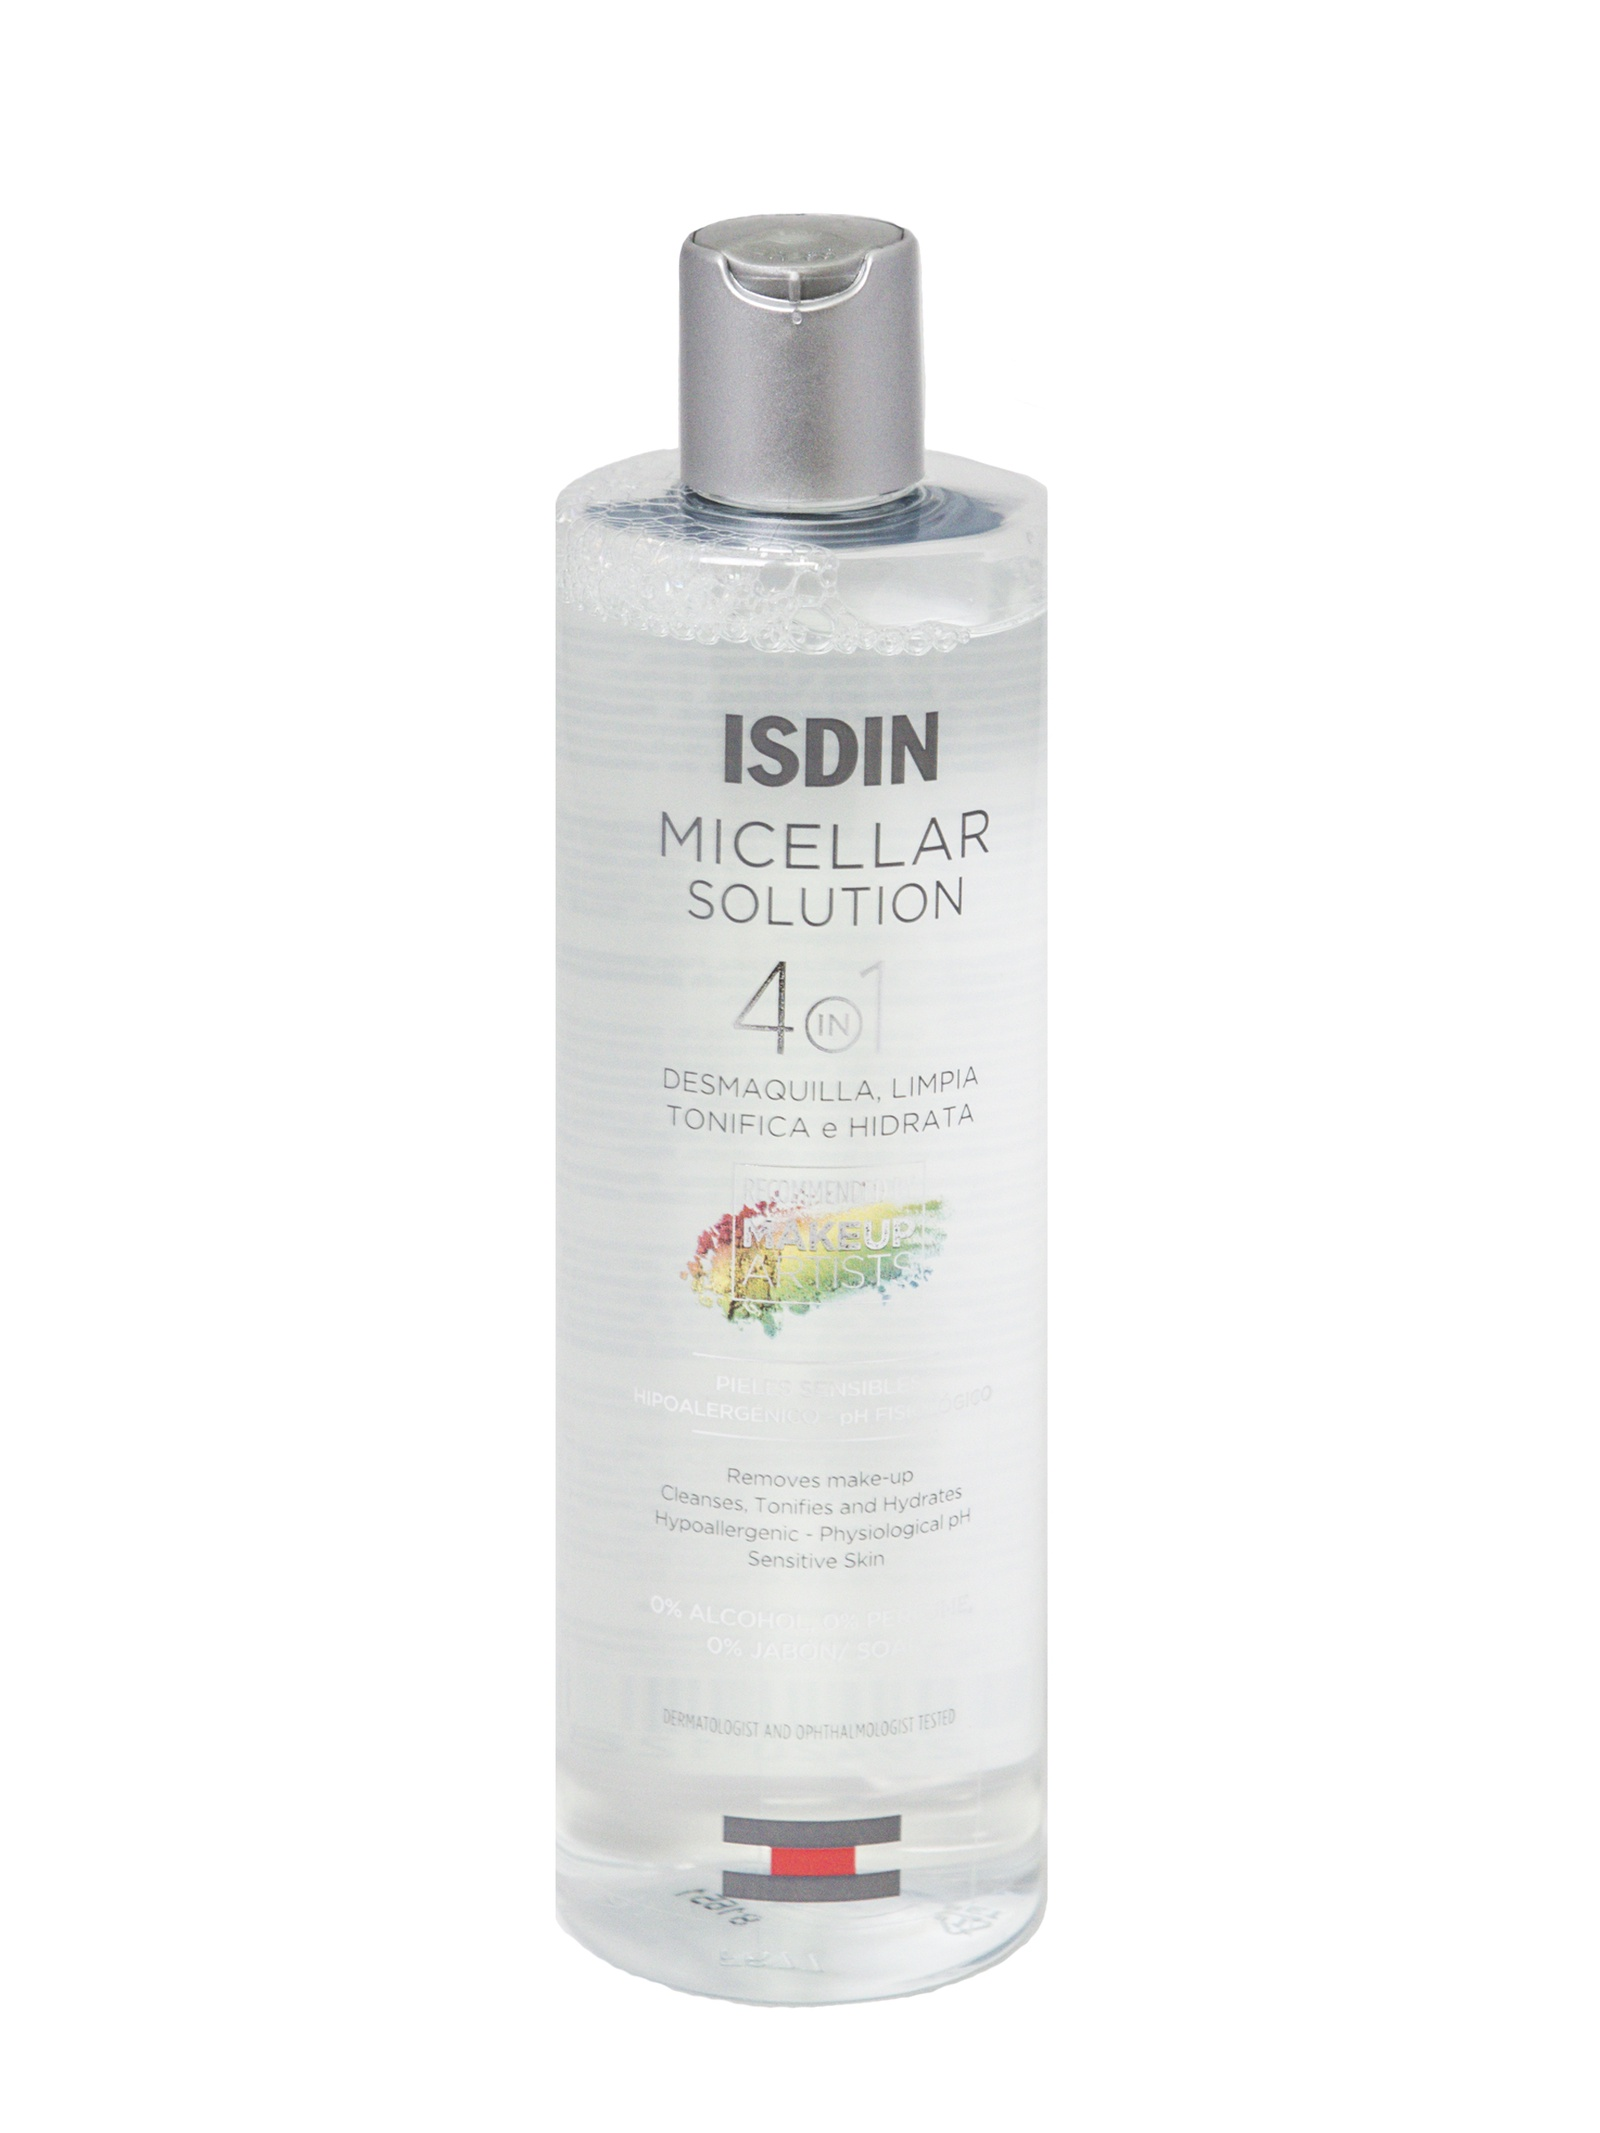 Вода мицеллярная ISDIN Вода мицеллярная 4 в 1 / Micellar solution 4 in 1, 400 мл